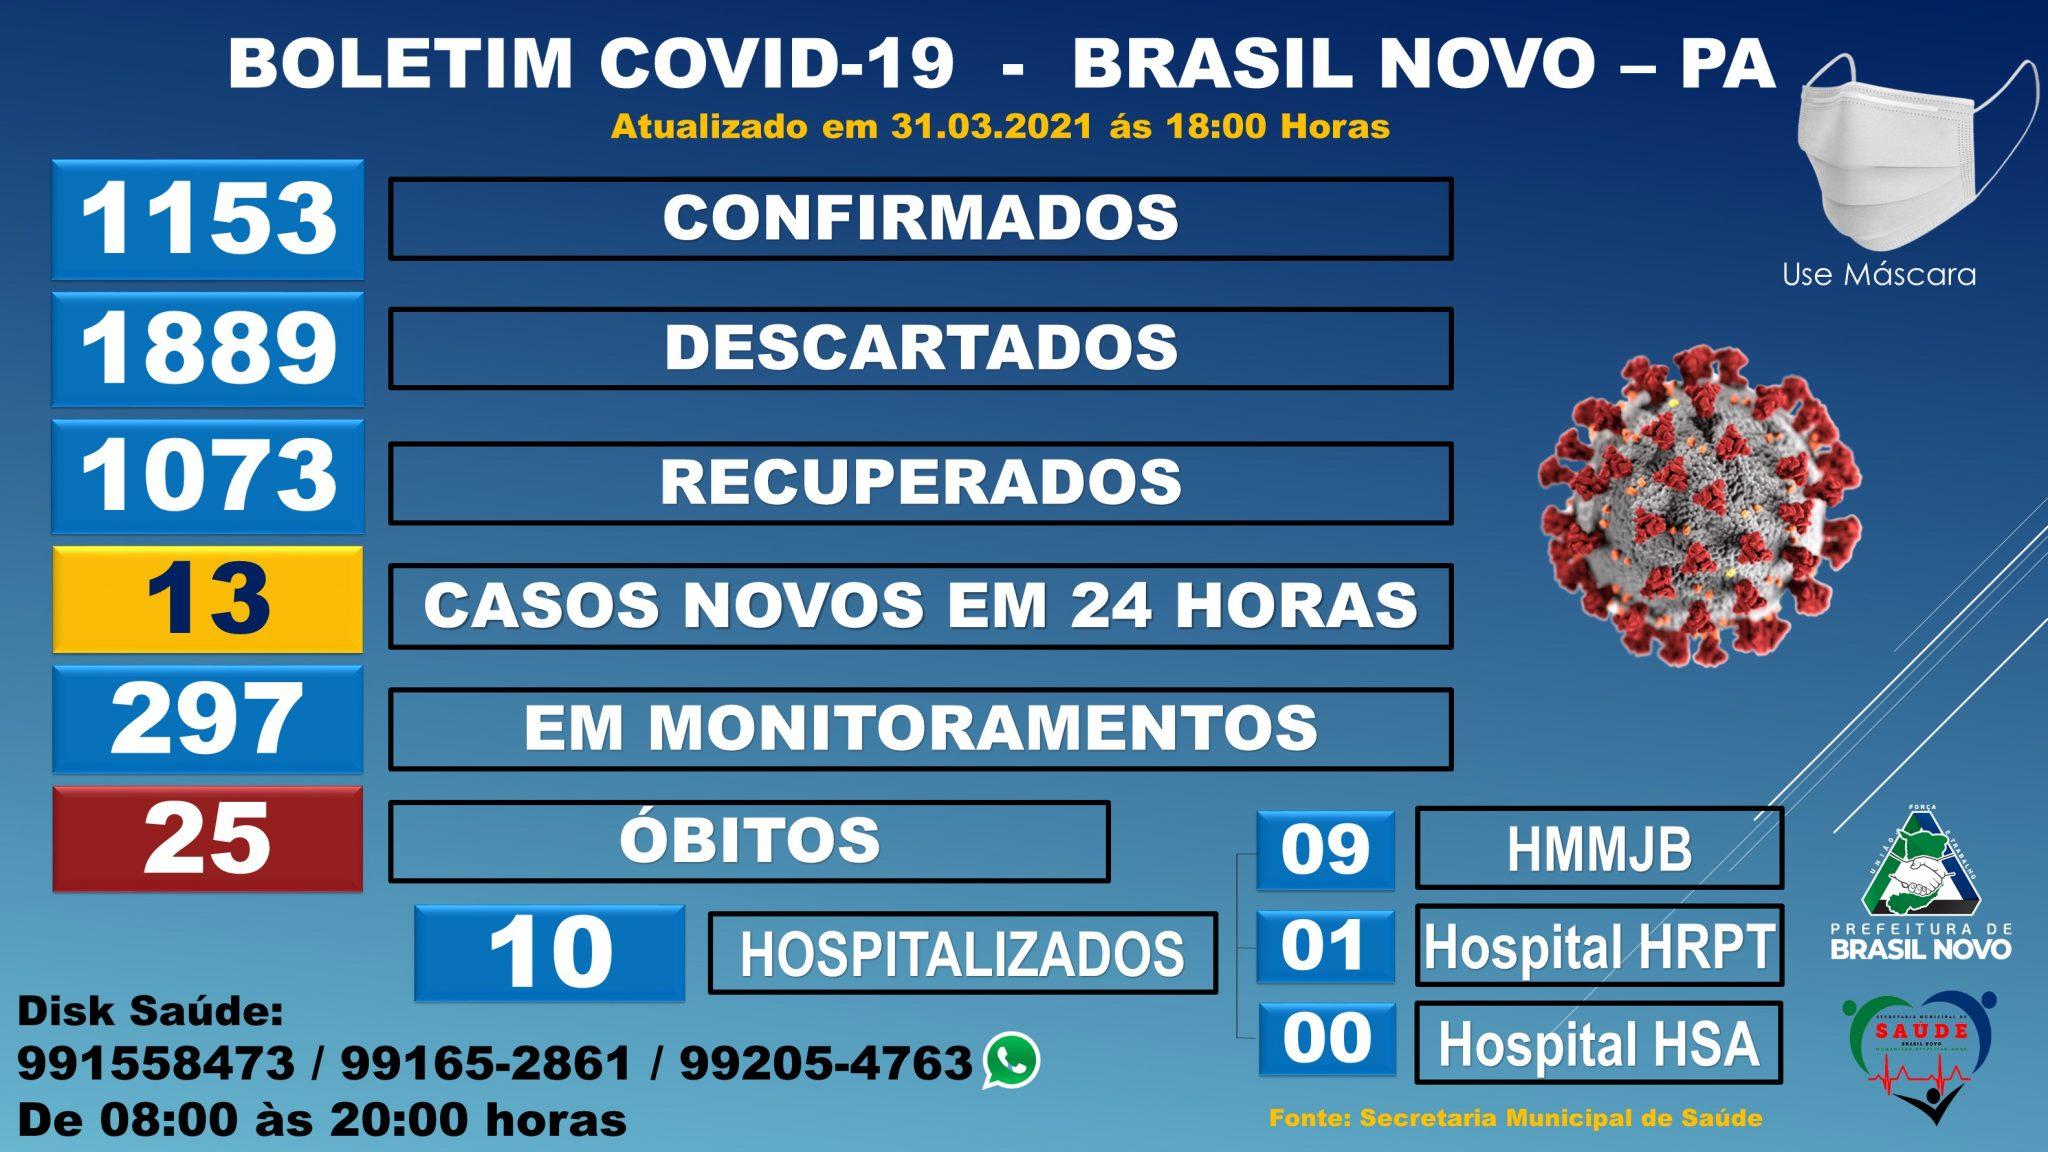 Boletim COVID-19 (31/03/2021)